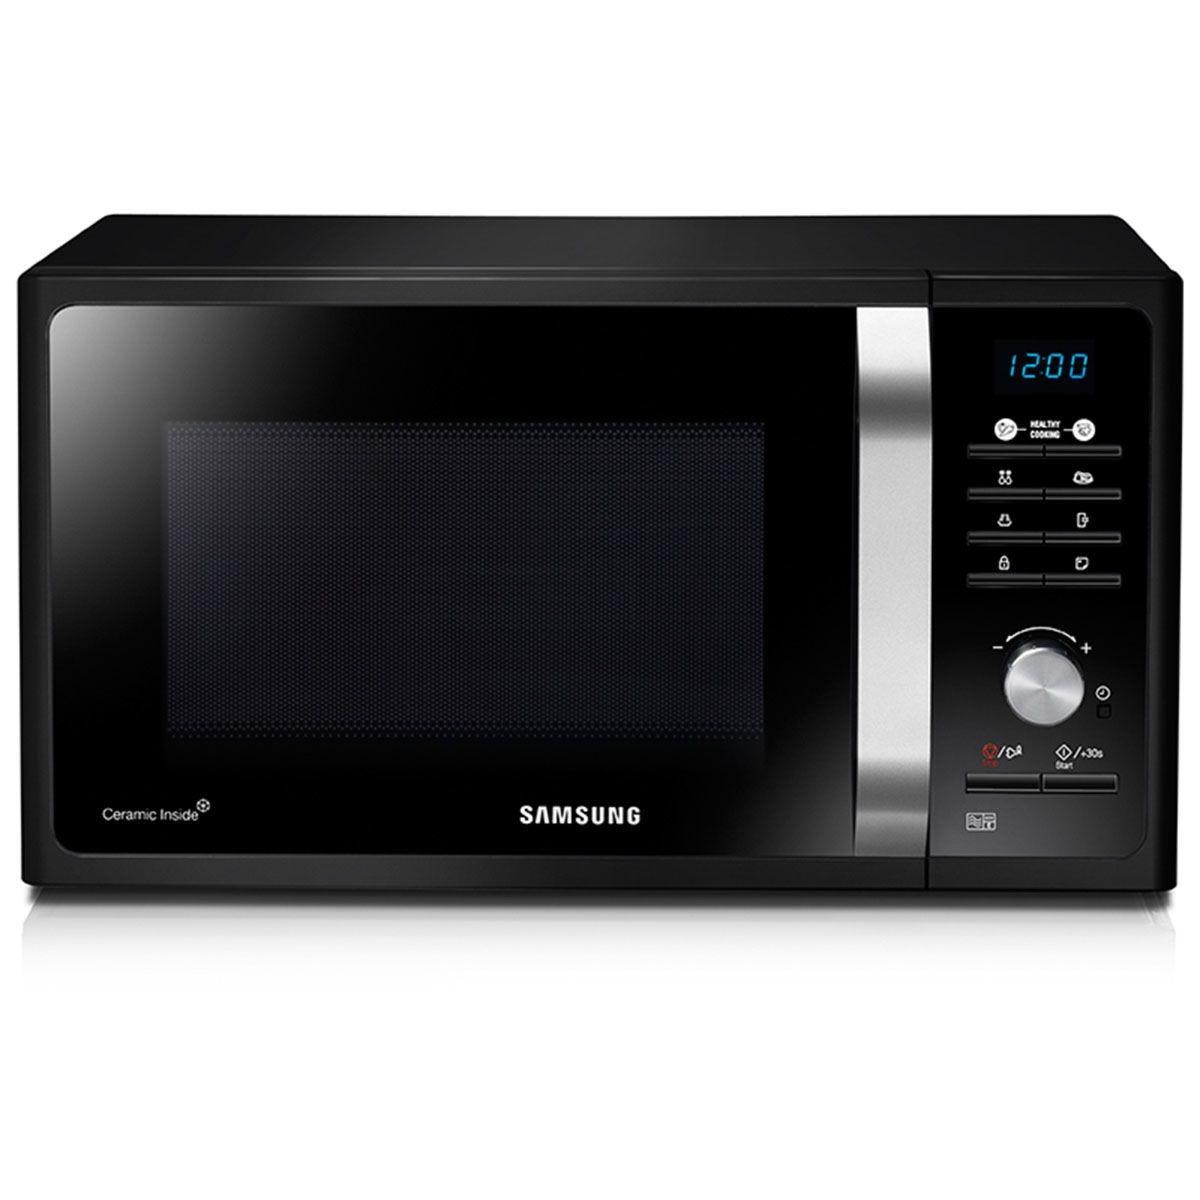 Samsung 23L 800W Solo Manual Microwave Oven - Black